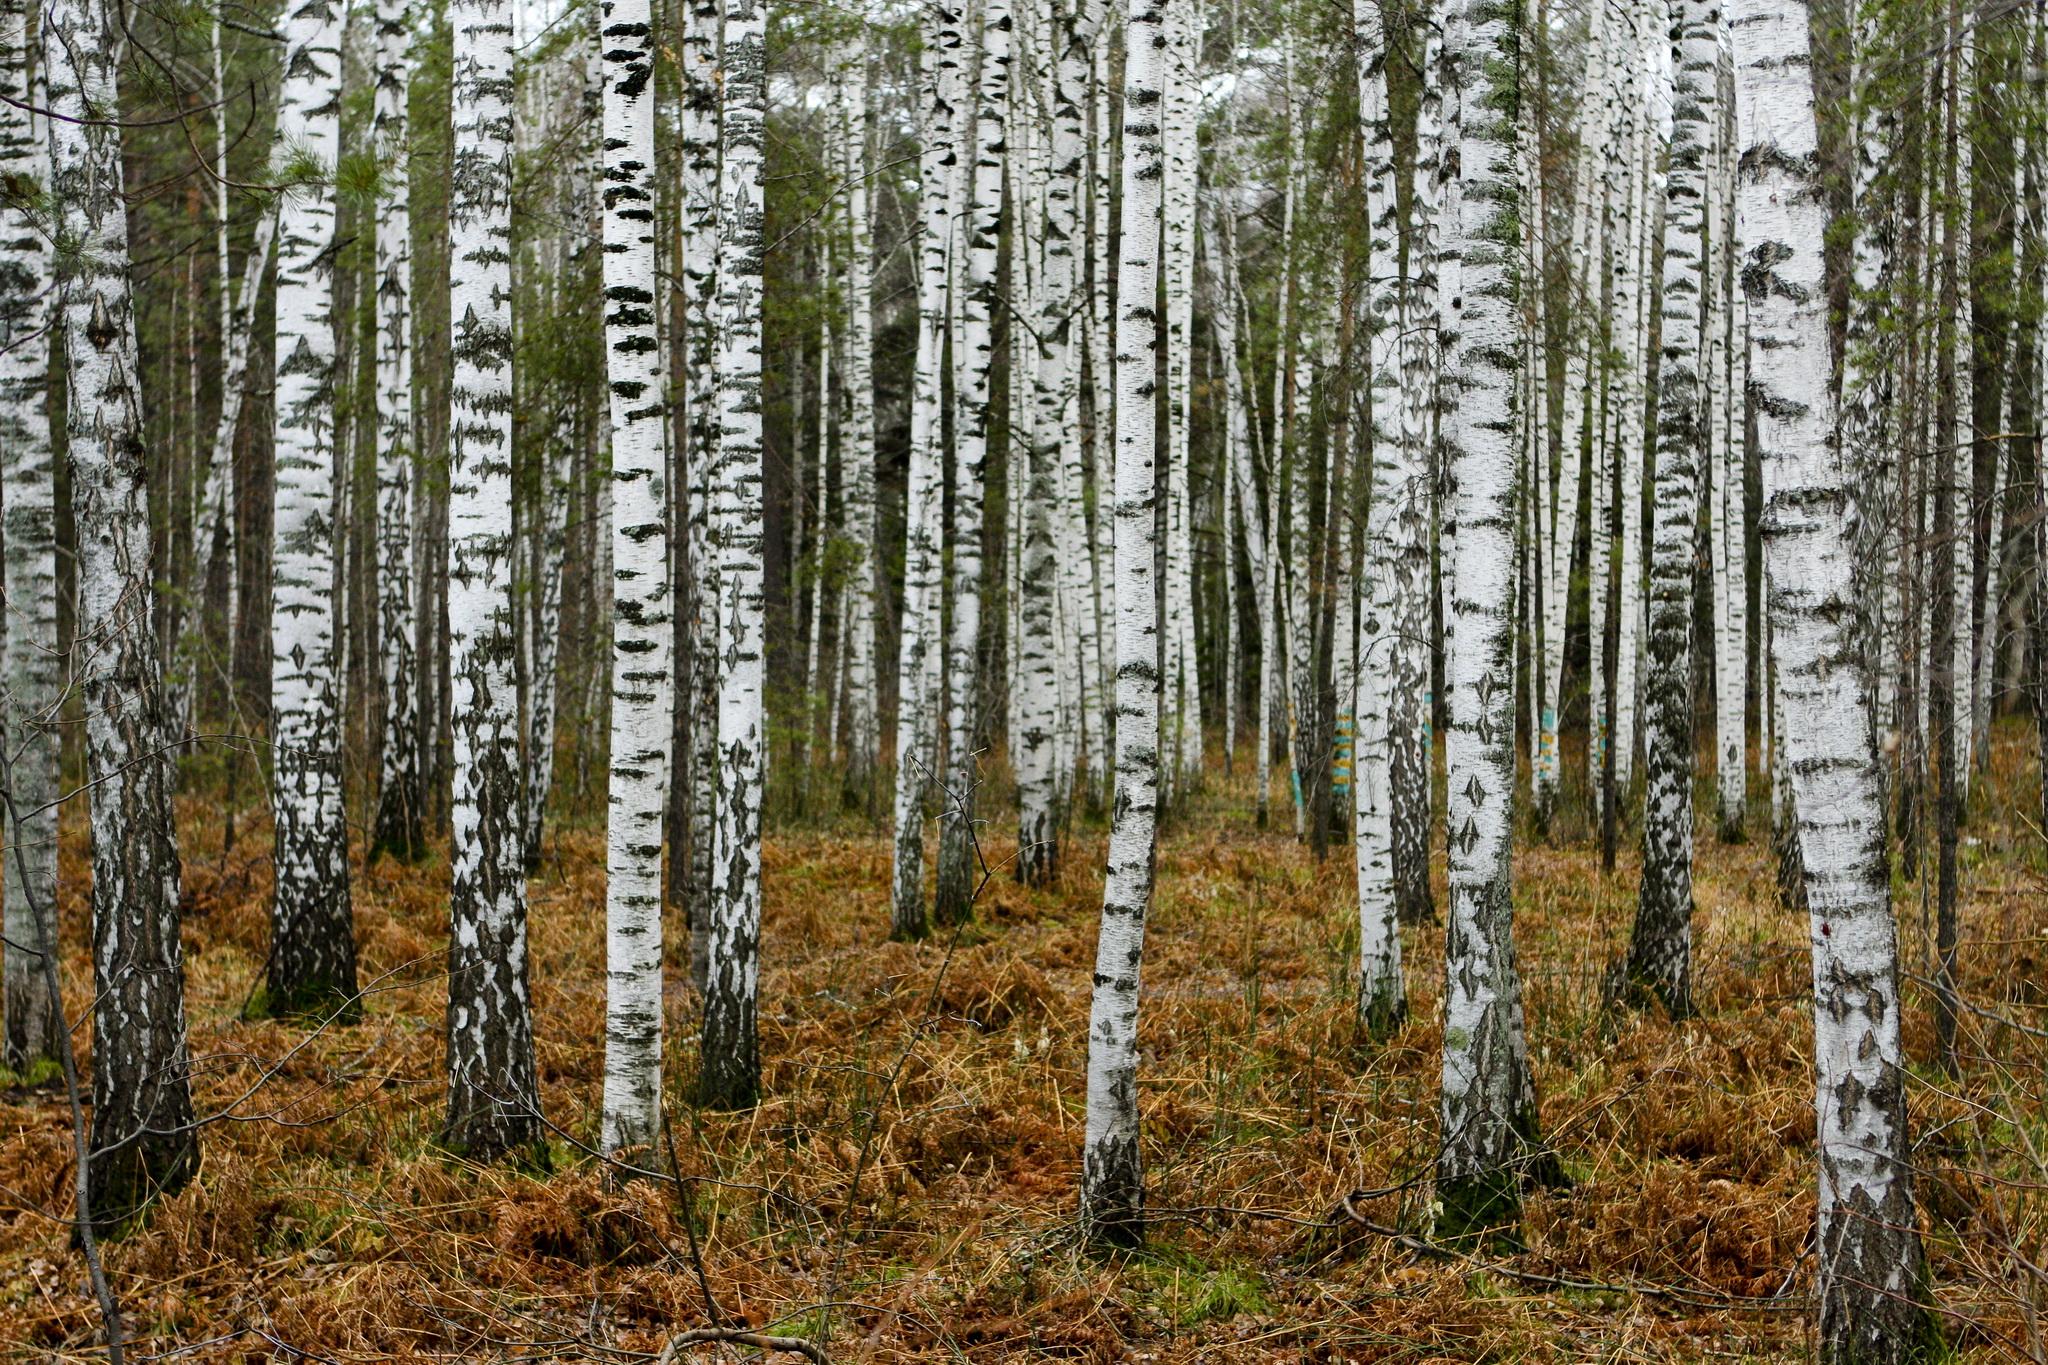 Birch Tree Wallpaper 25332 2048x1365 Px